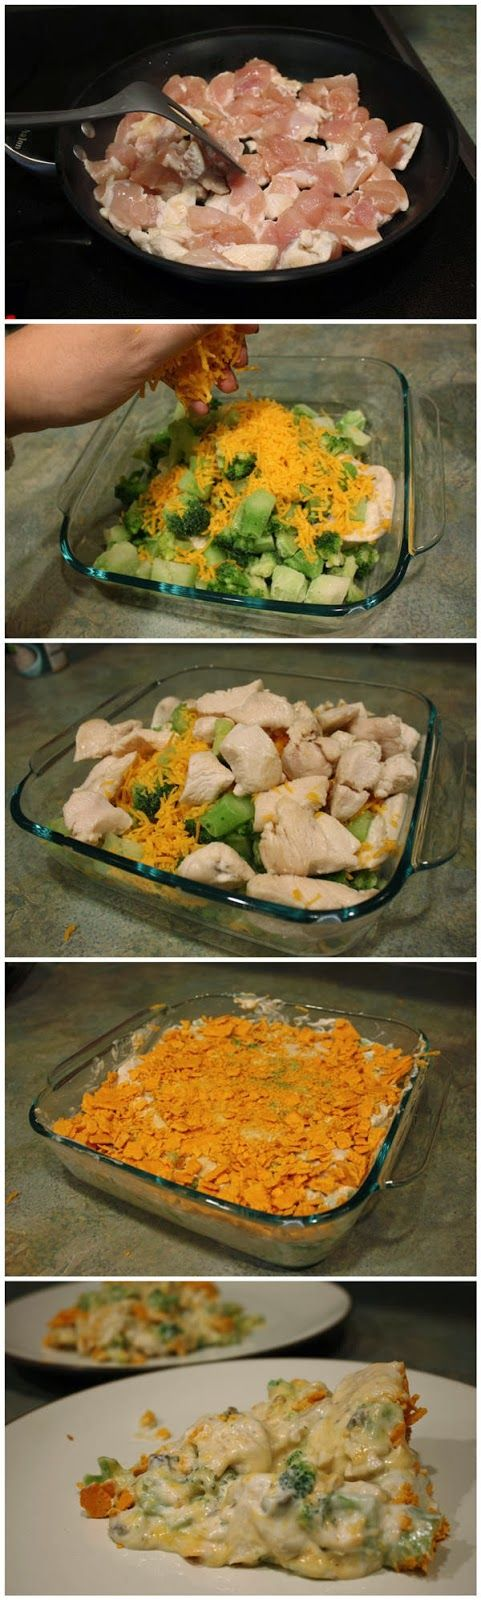 Chicken Broccoli Casserole - Recipebest